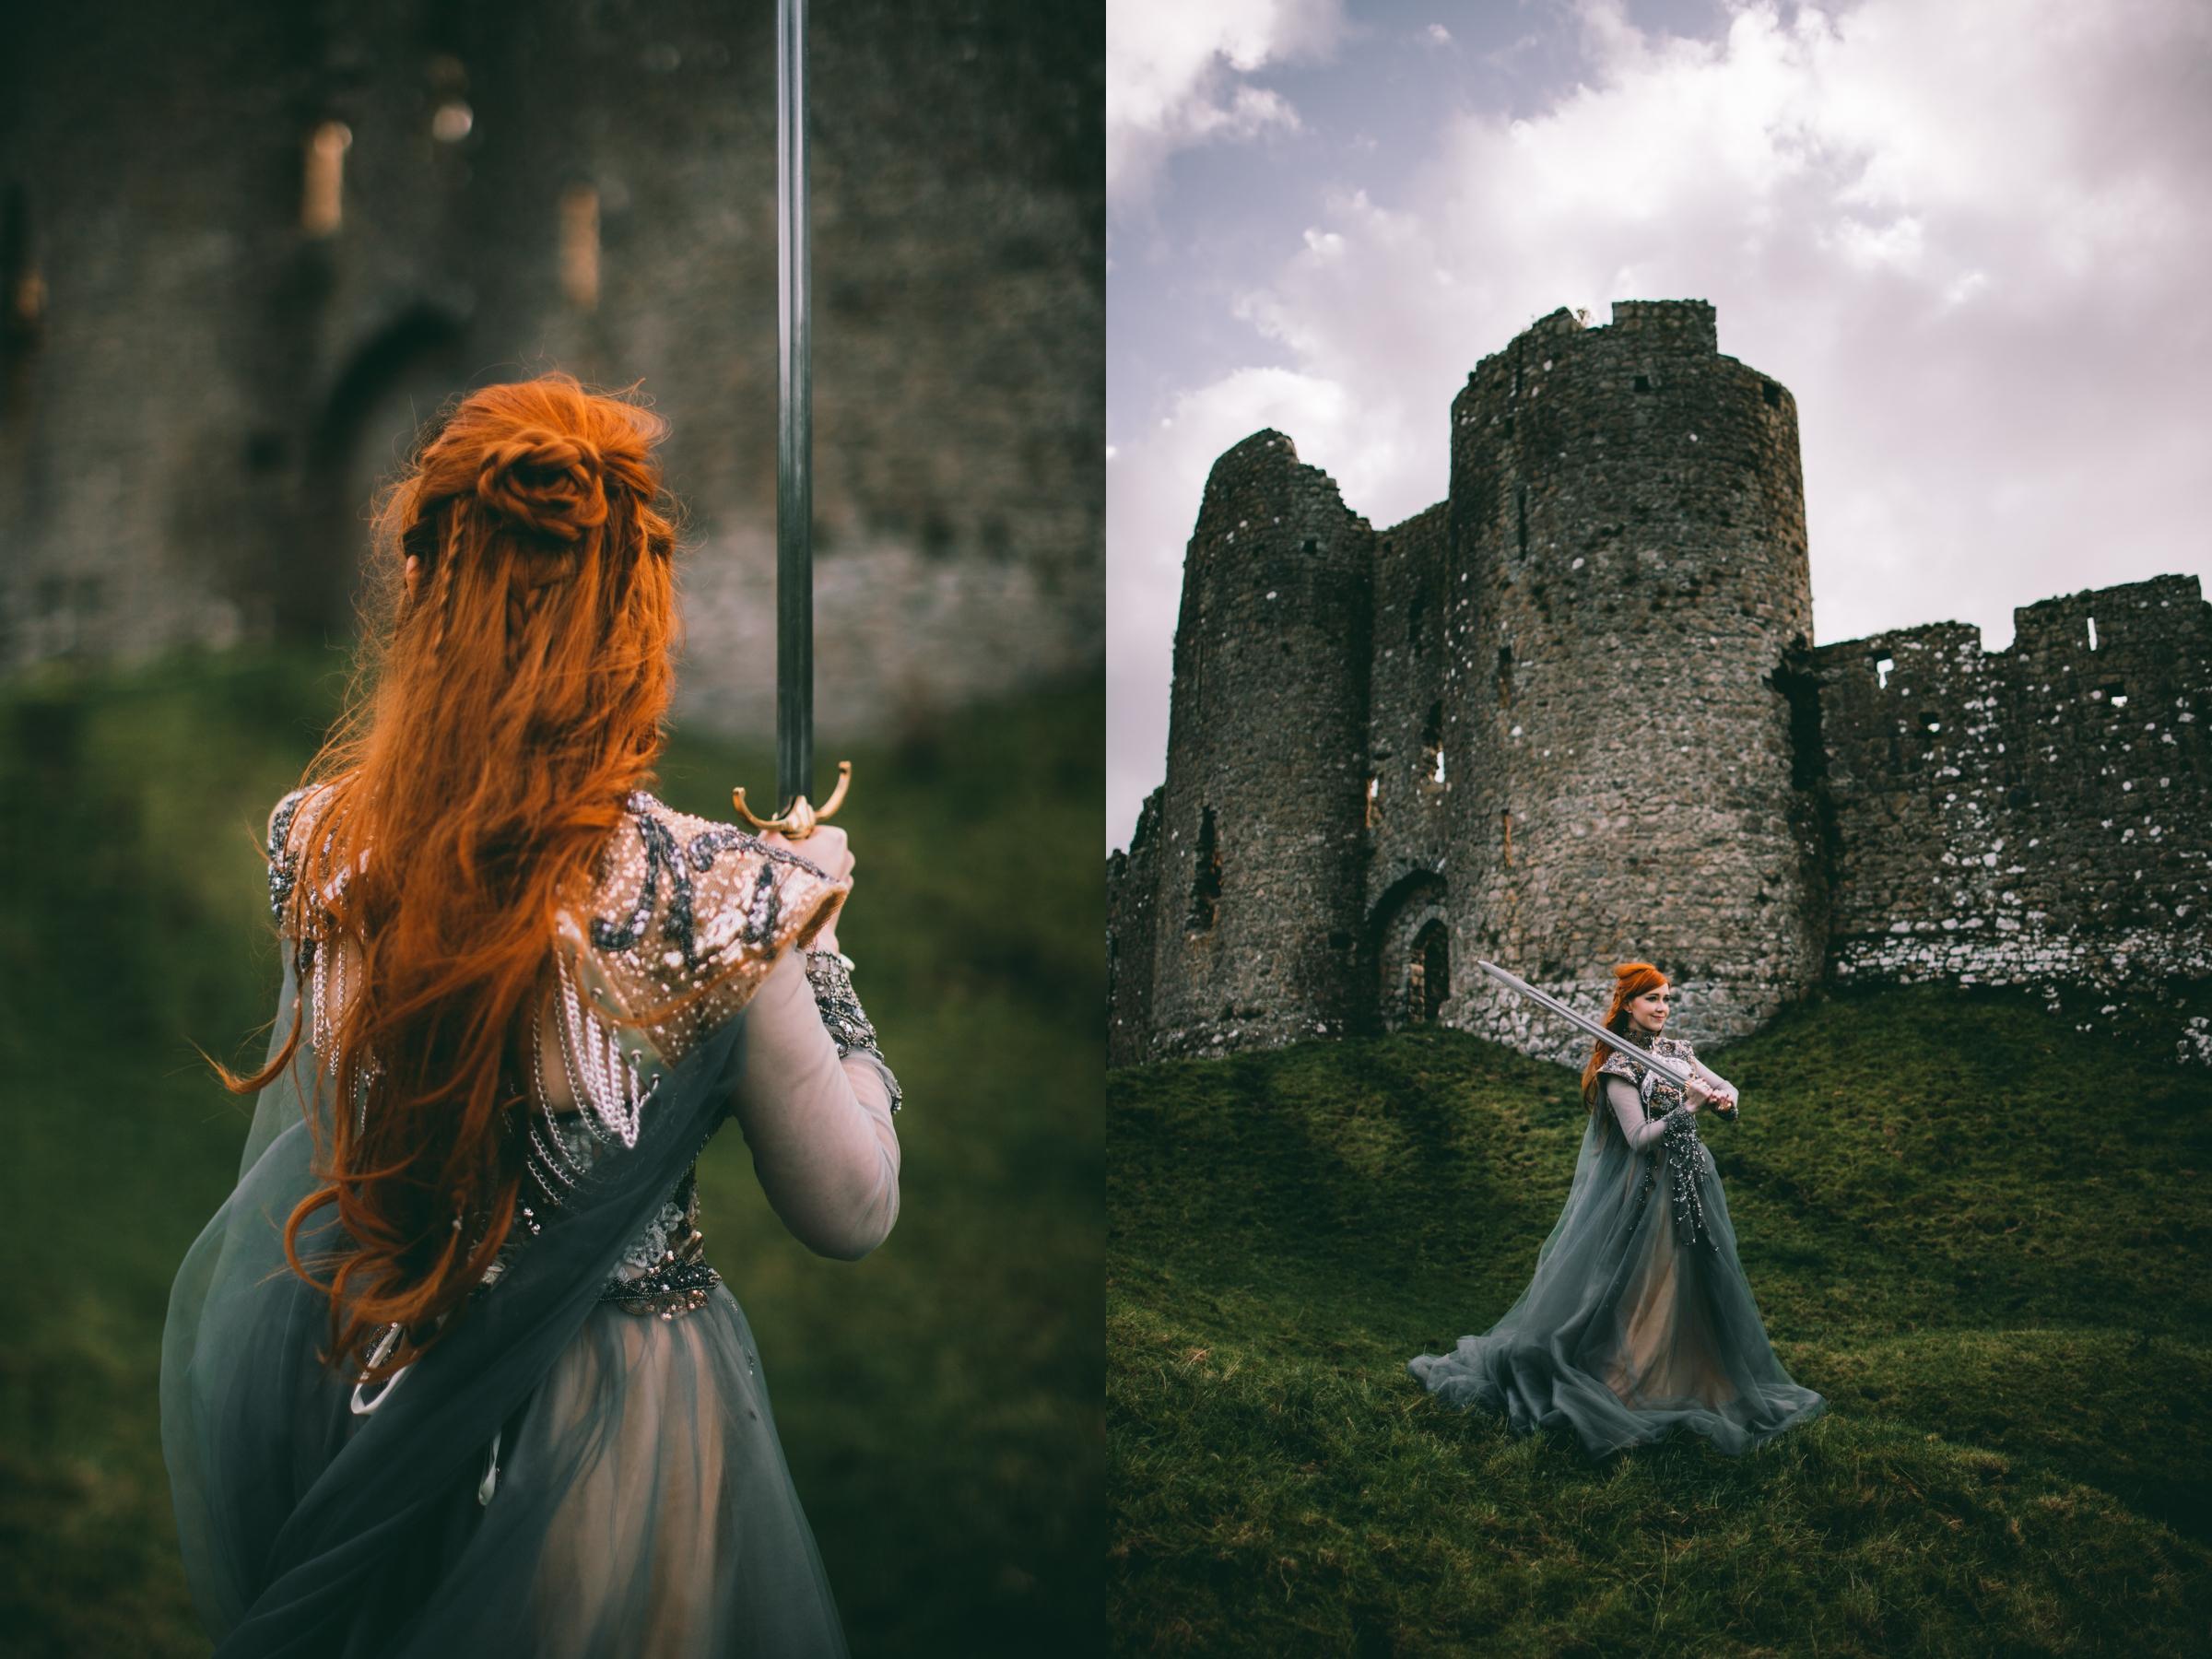 castle-3 copy 2-side